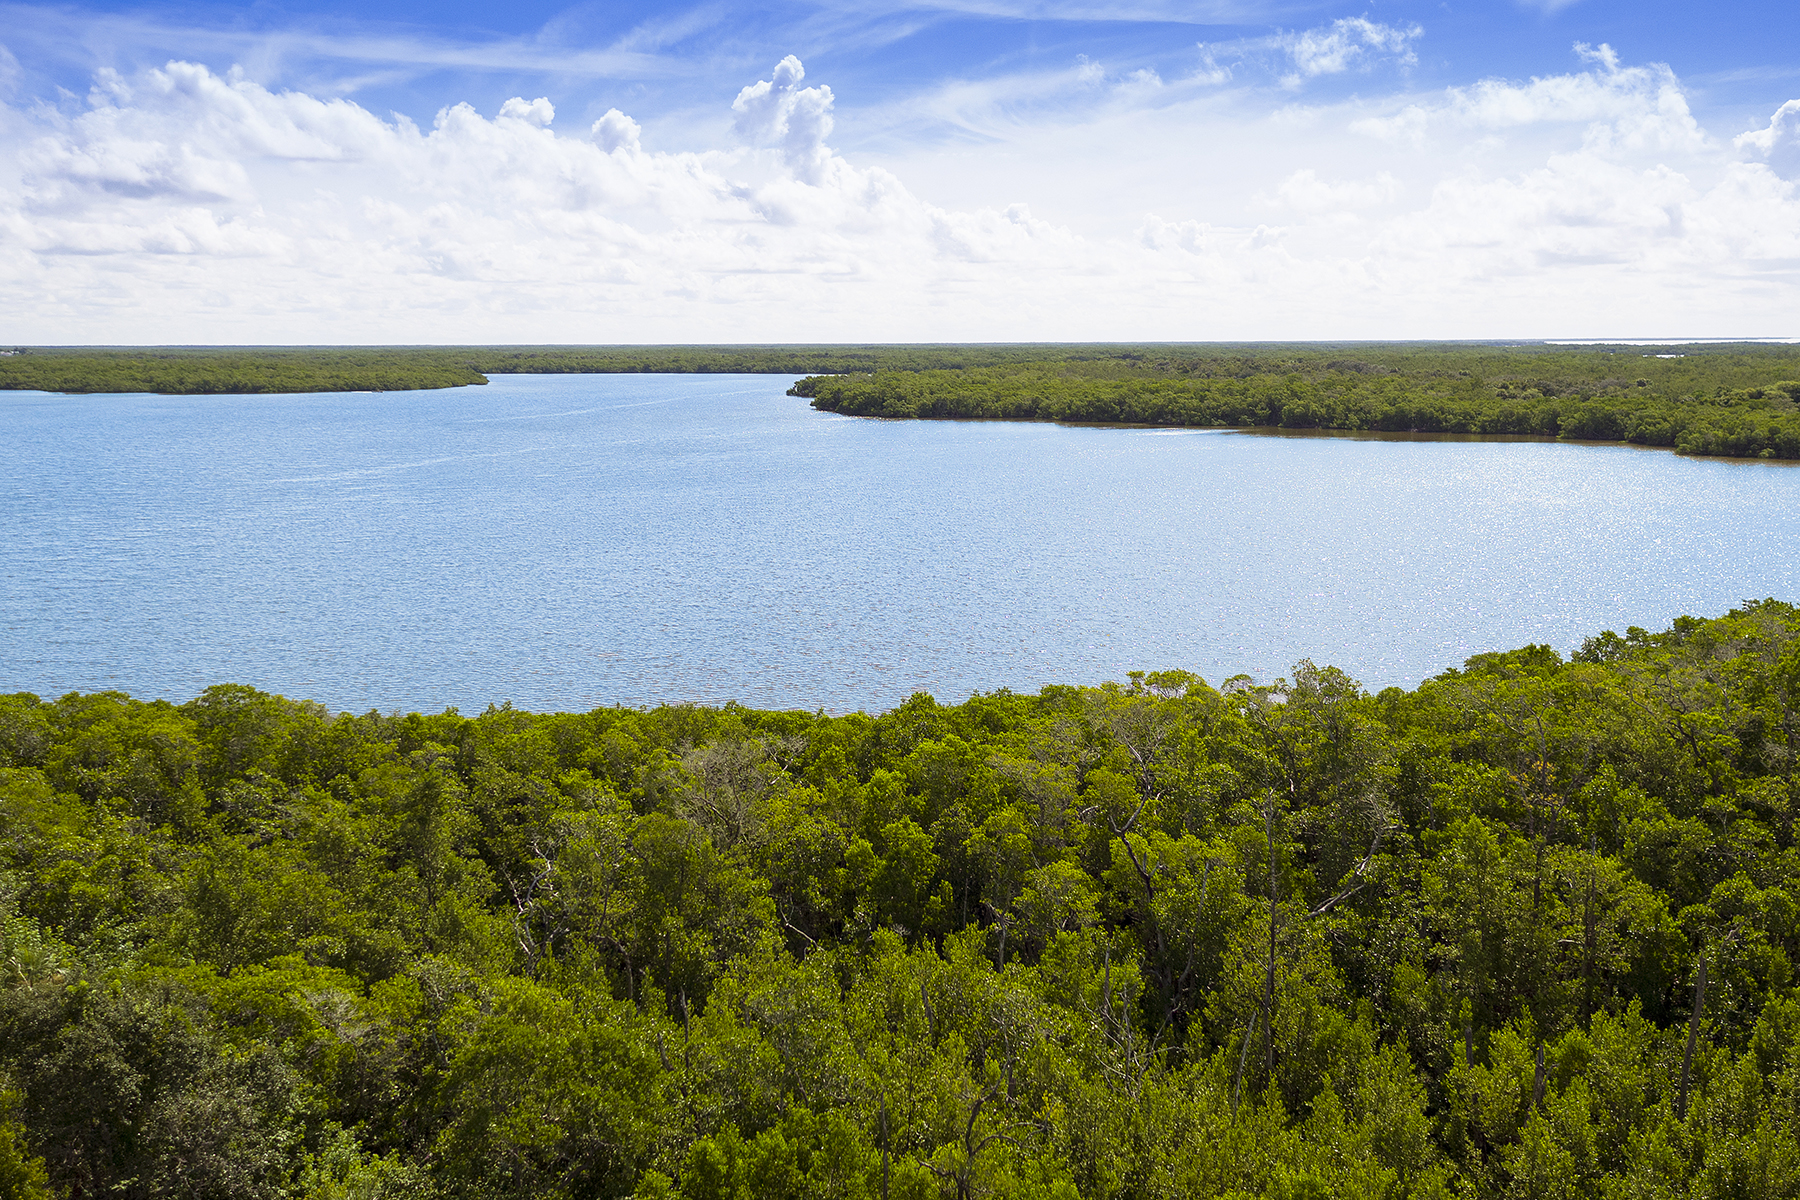 Terreno por un Venta en MARCO ISLAND - HORR'S ISLAND 900 Whiskey Creek Dr Marco Island, Florida, 34145 Estados Unidos